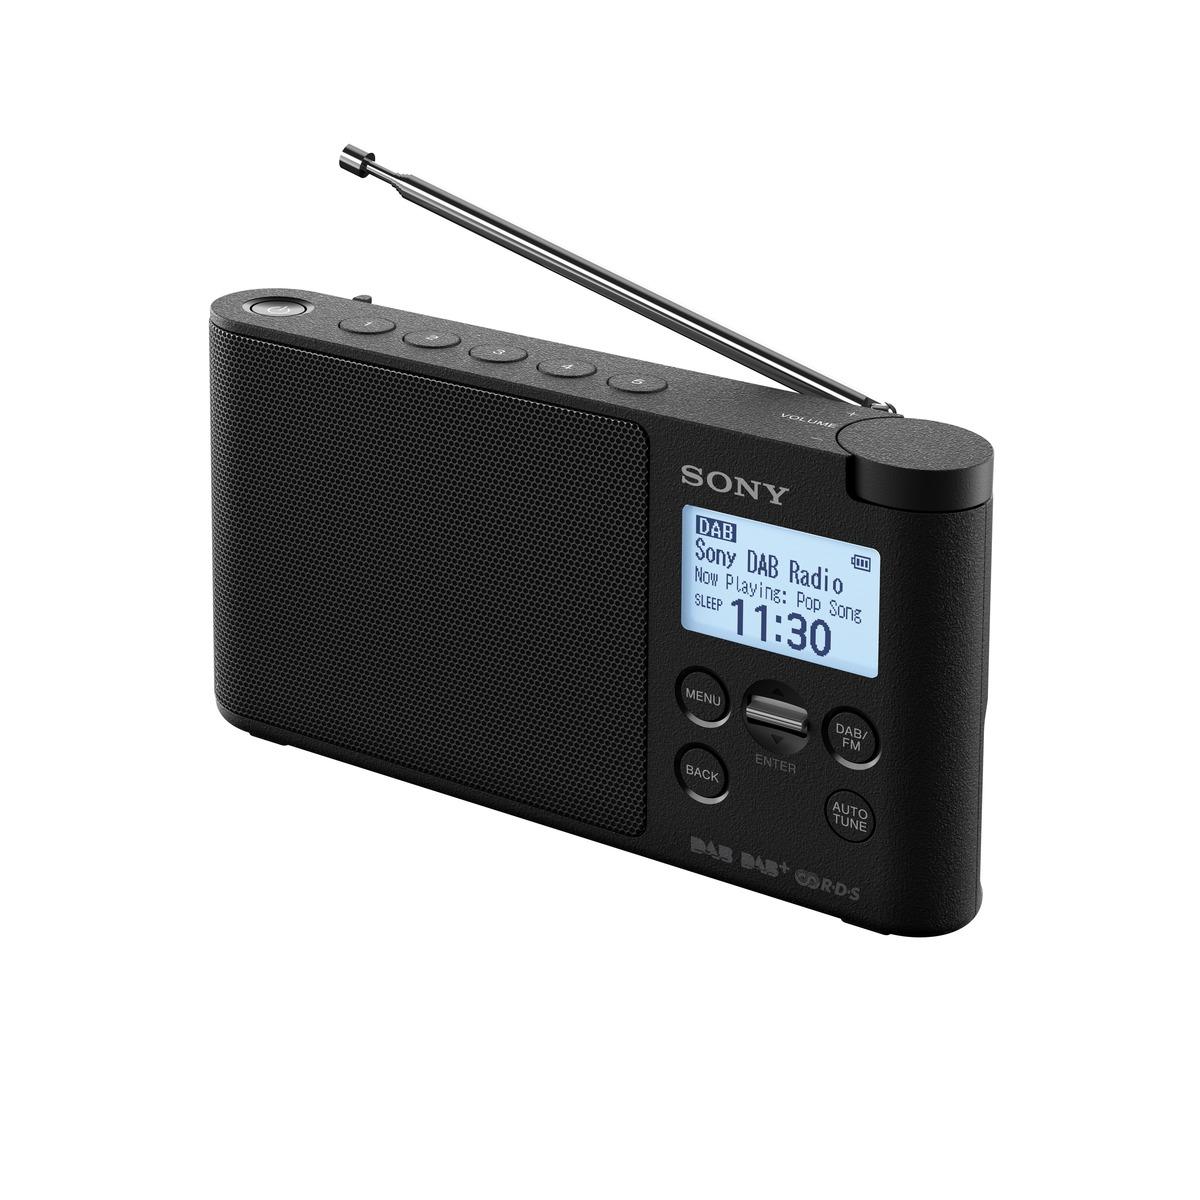 SONY XDR-S41DB Lehké a přenosné DAB/DAB+/FM rádio Black